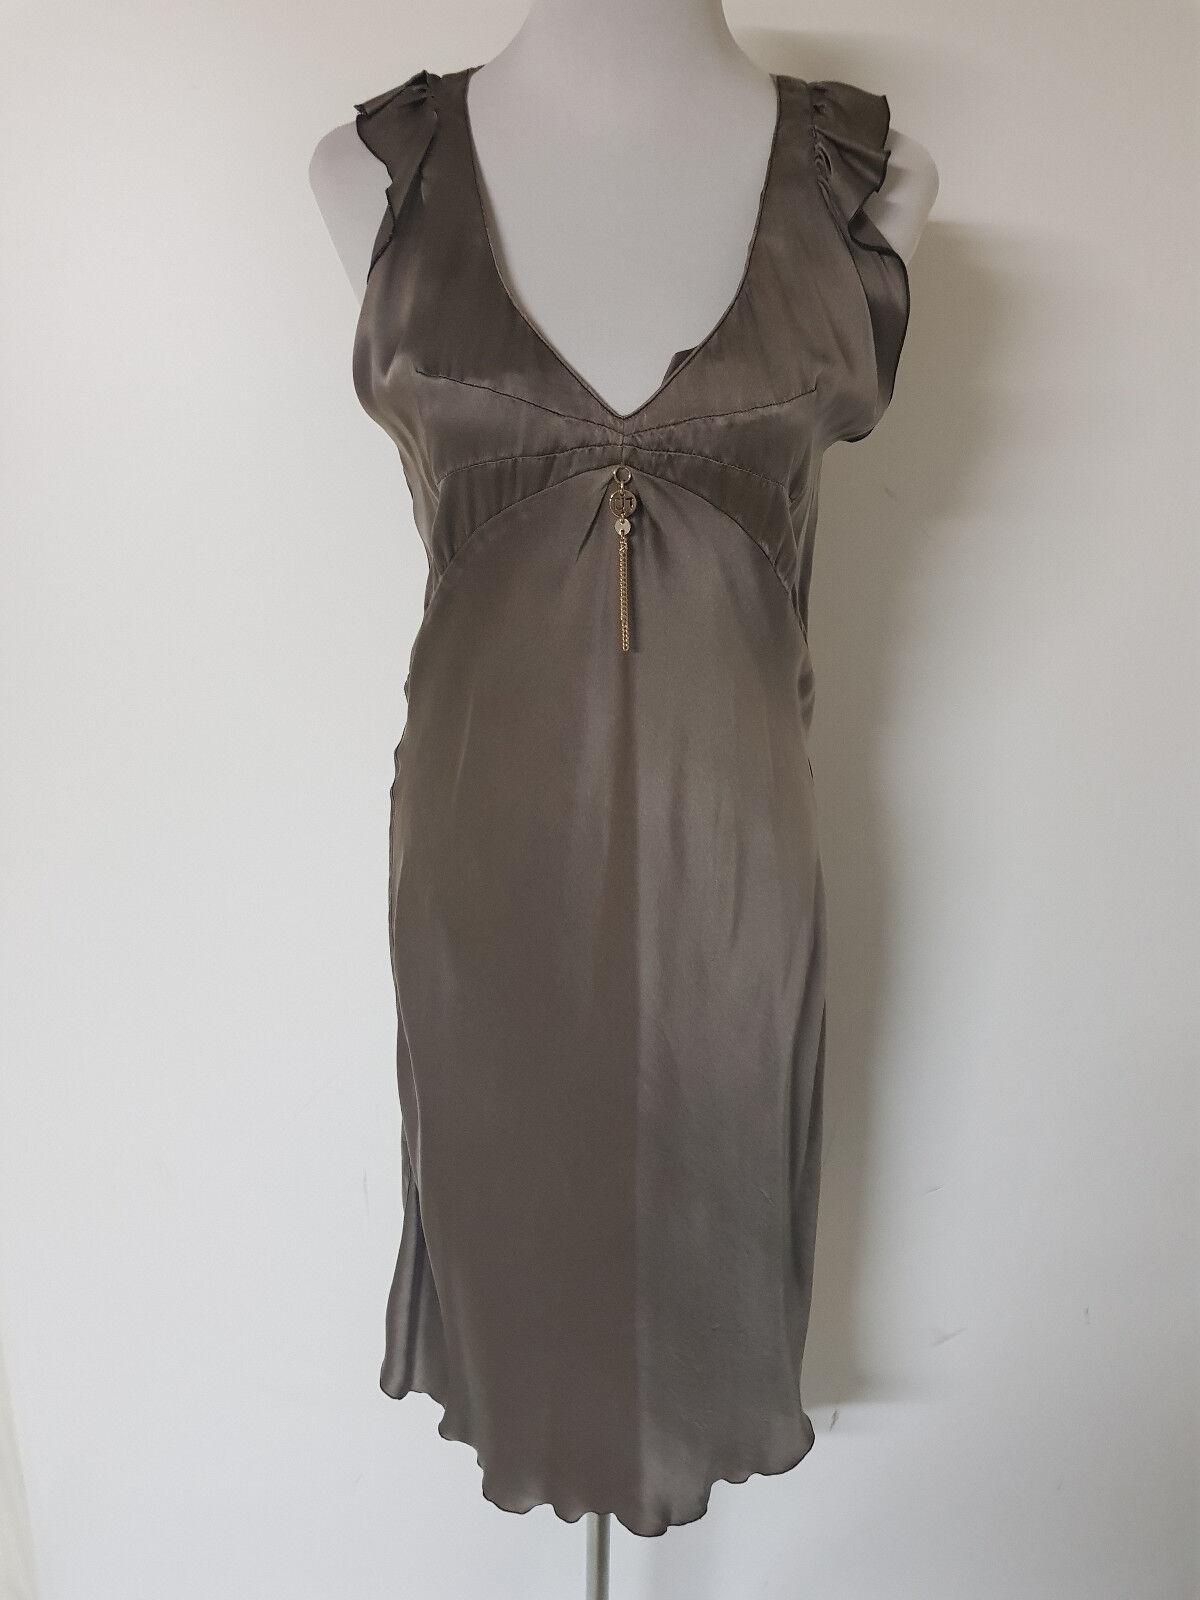 Trussardi Kleid Frau - Art. 561257 - Col Bronze - Rabatt - 65 %